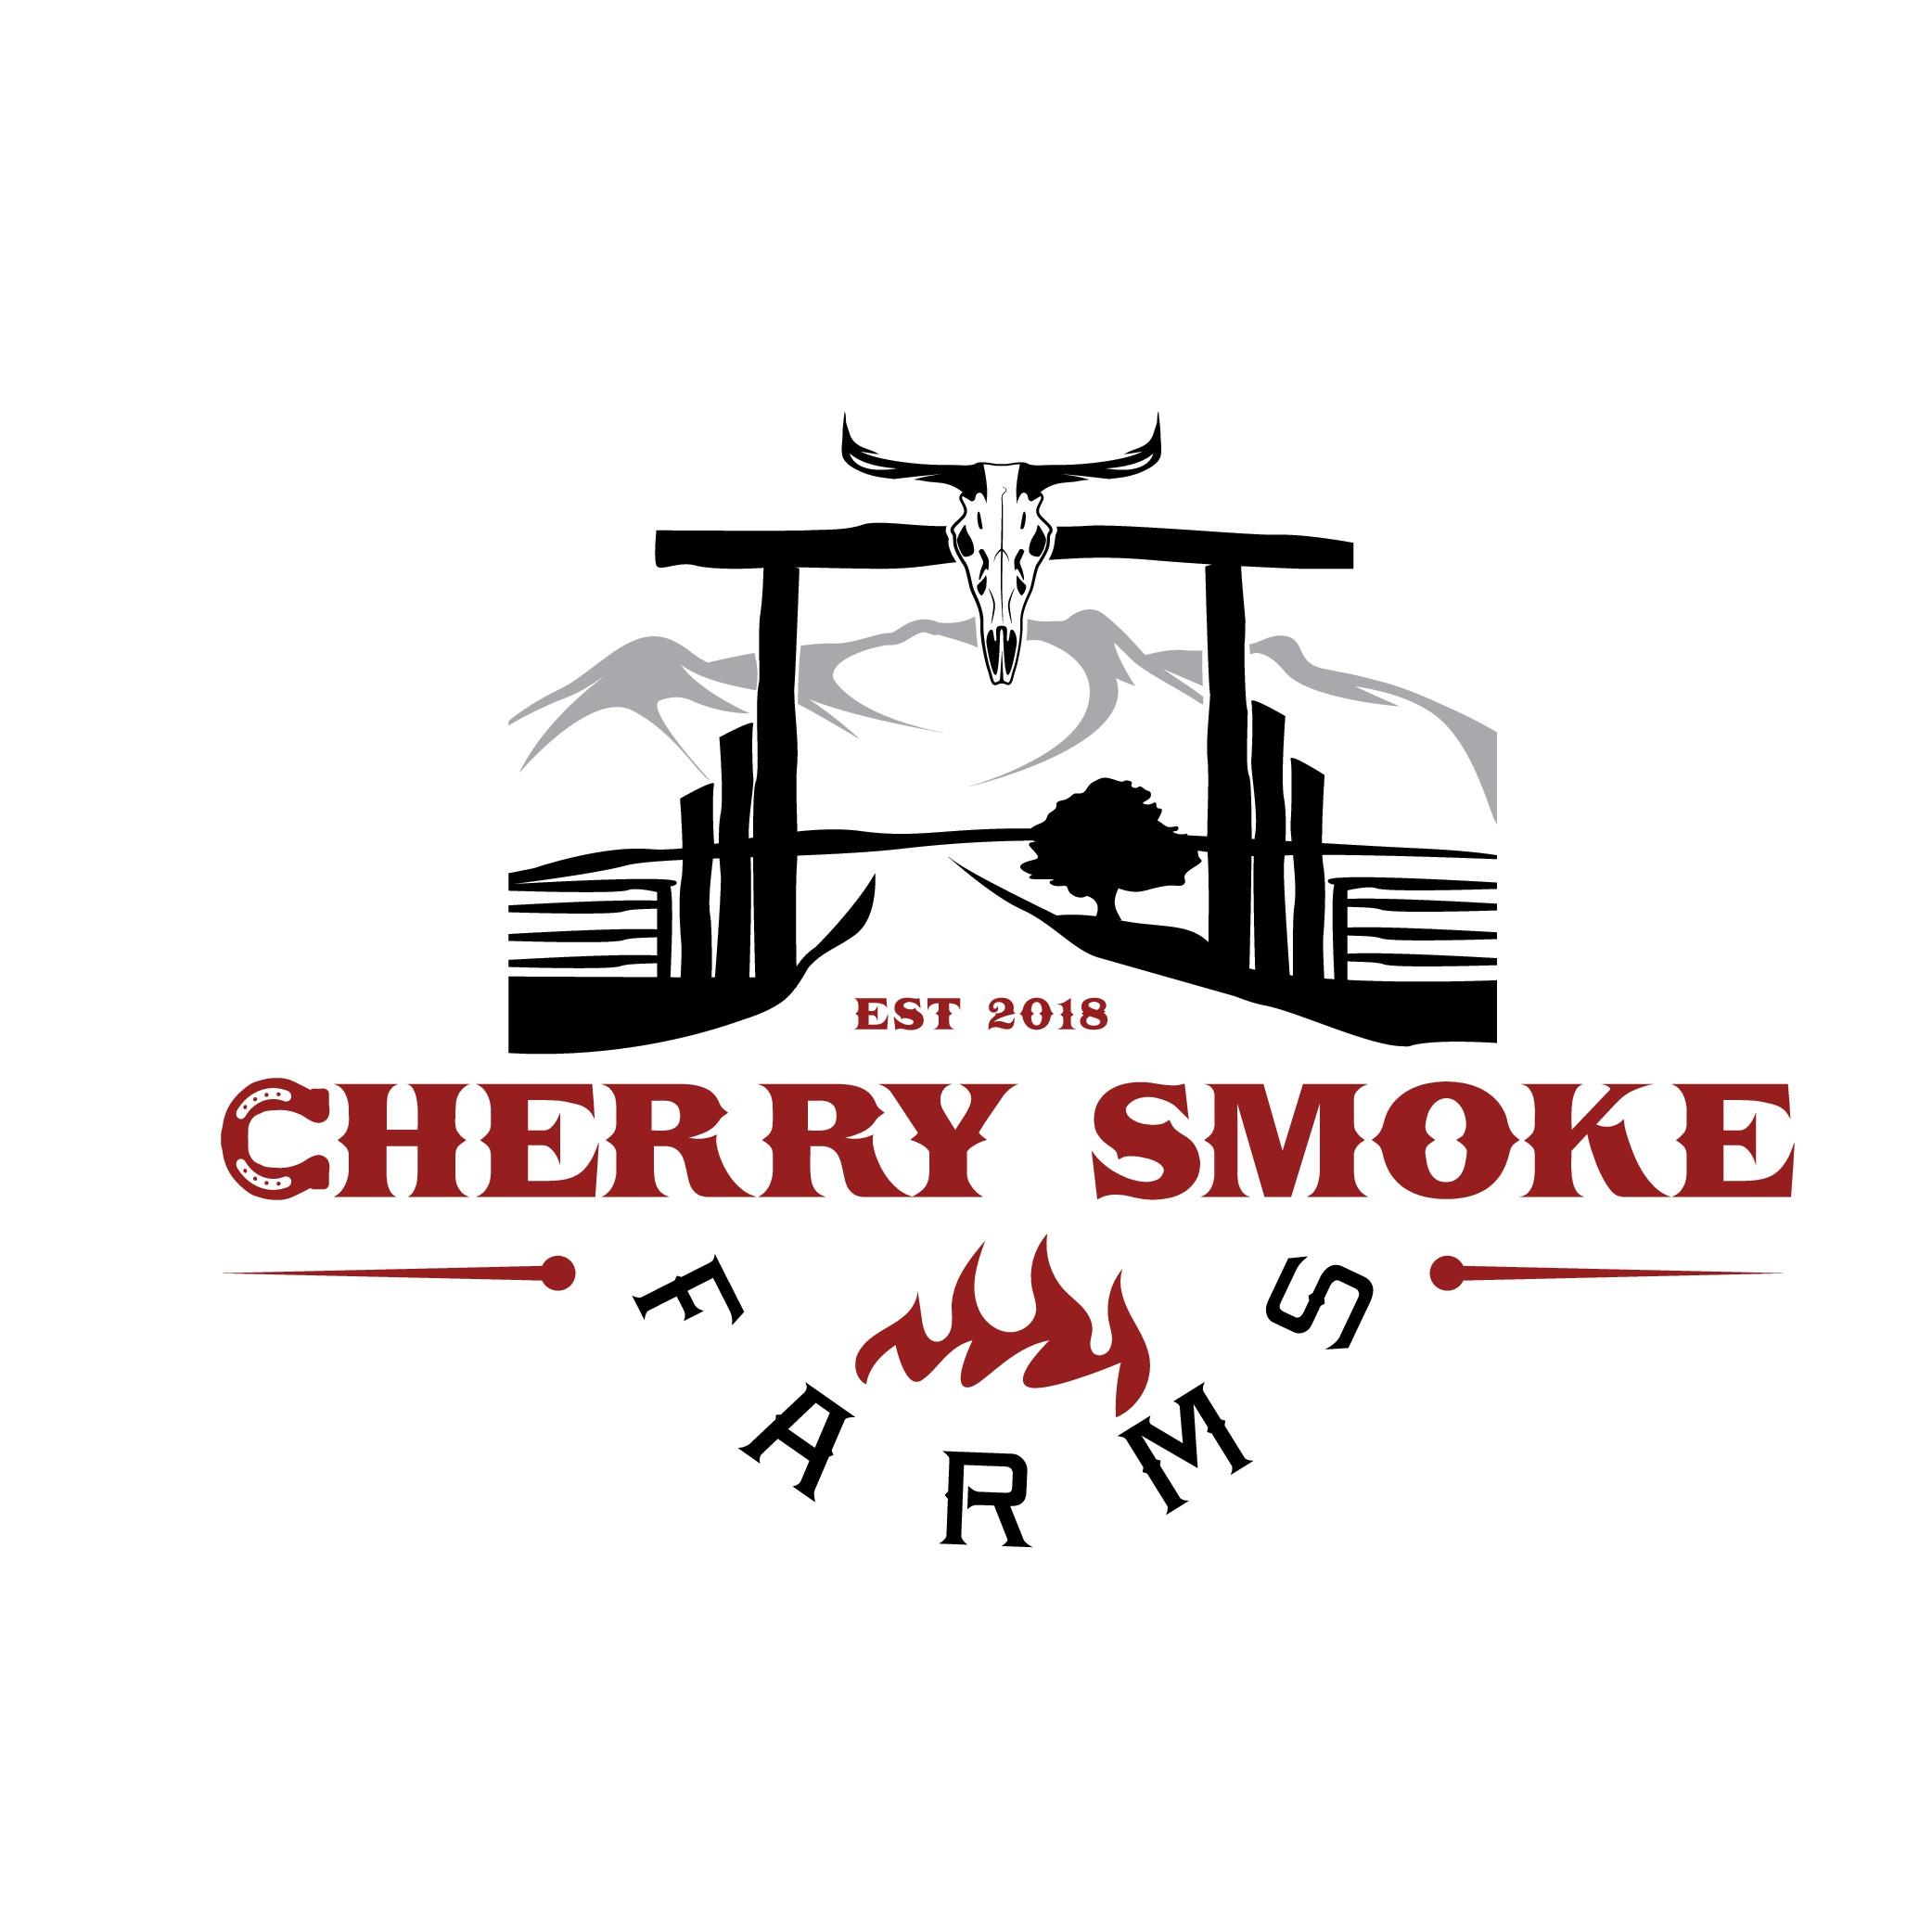 Beef Jerky logo for Cherry Smoke Farms